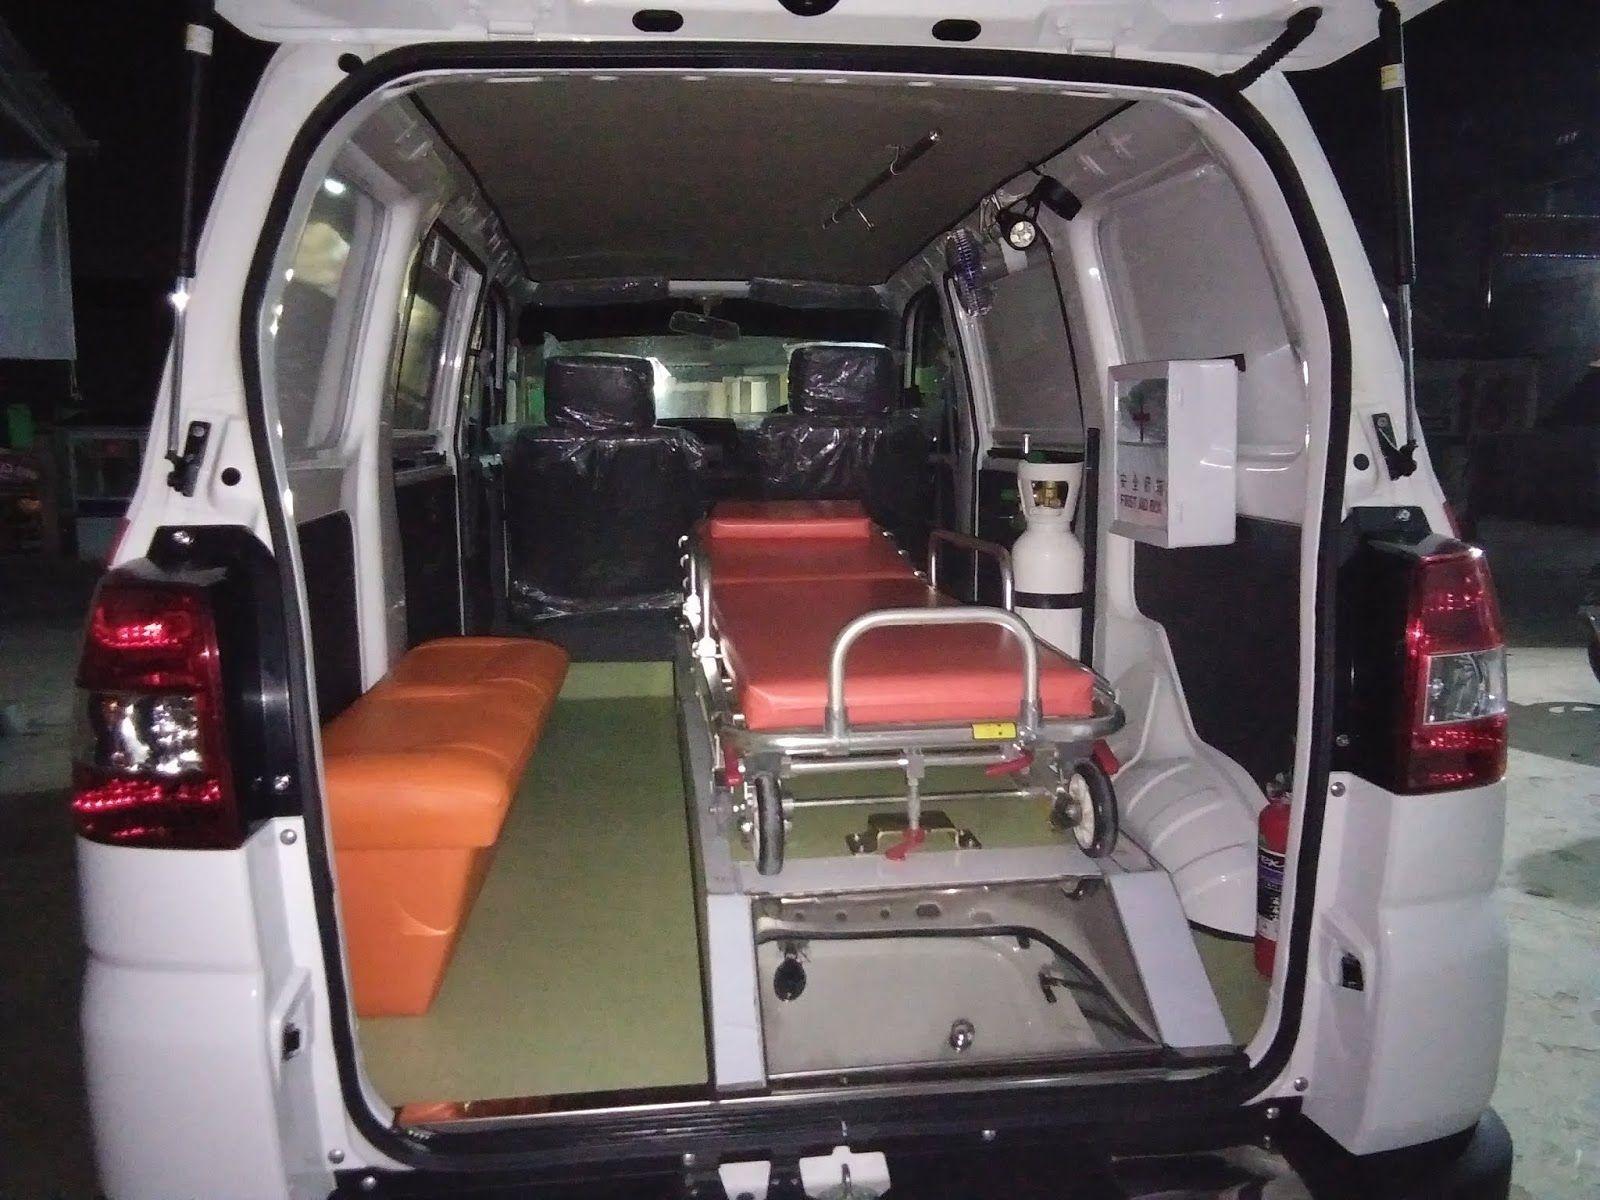 Ambulance Berlian Agen Mobil Ambulance Penyedia Ambulance Desa Siaga 081284074126 Mobil Pedesaan Van